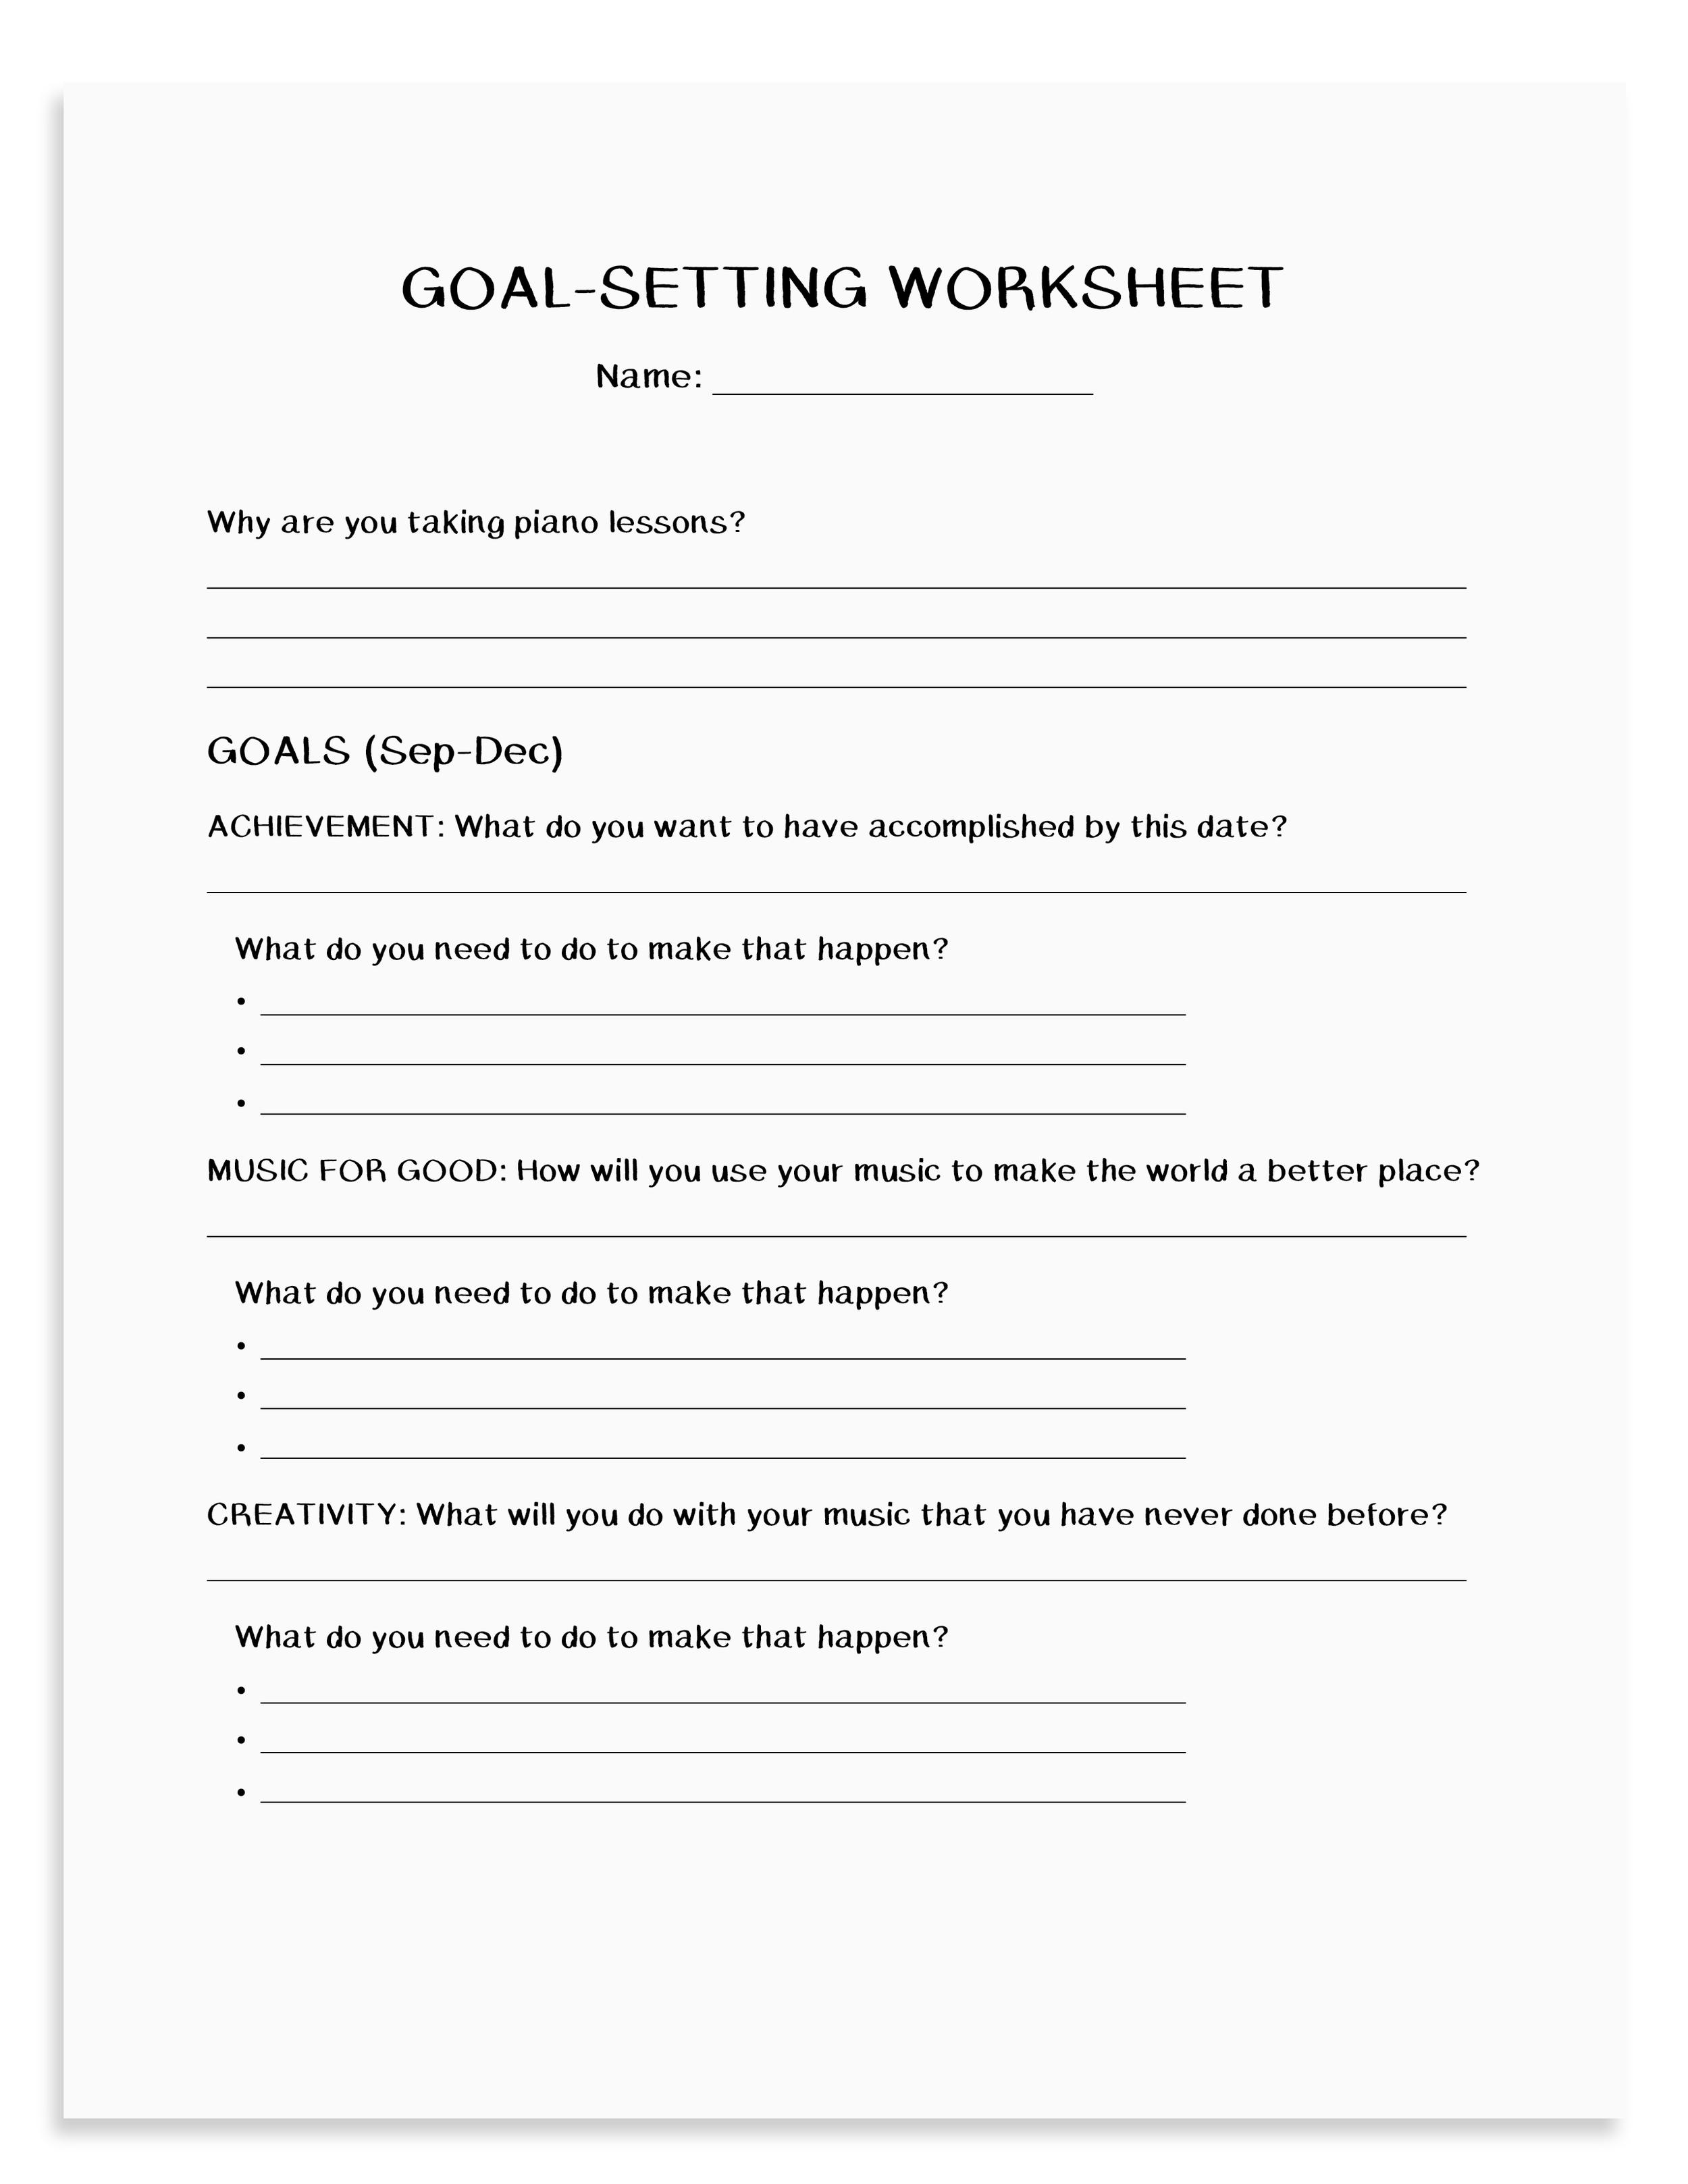 Goal Setting Worksheet-20.png